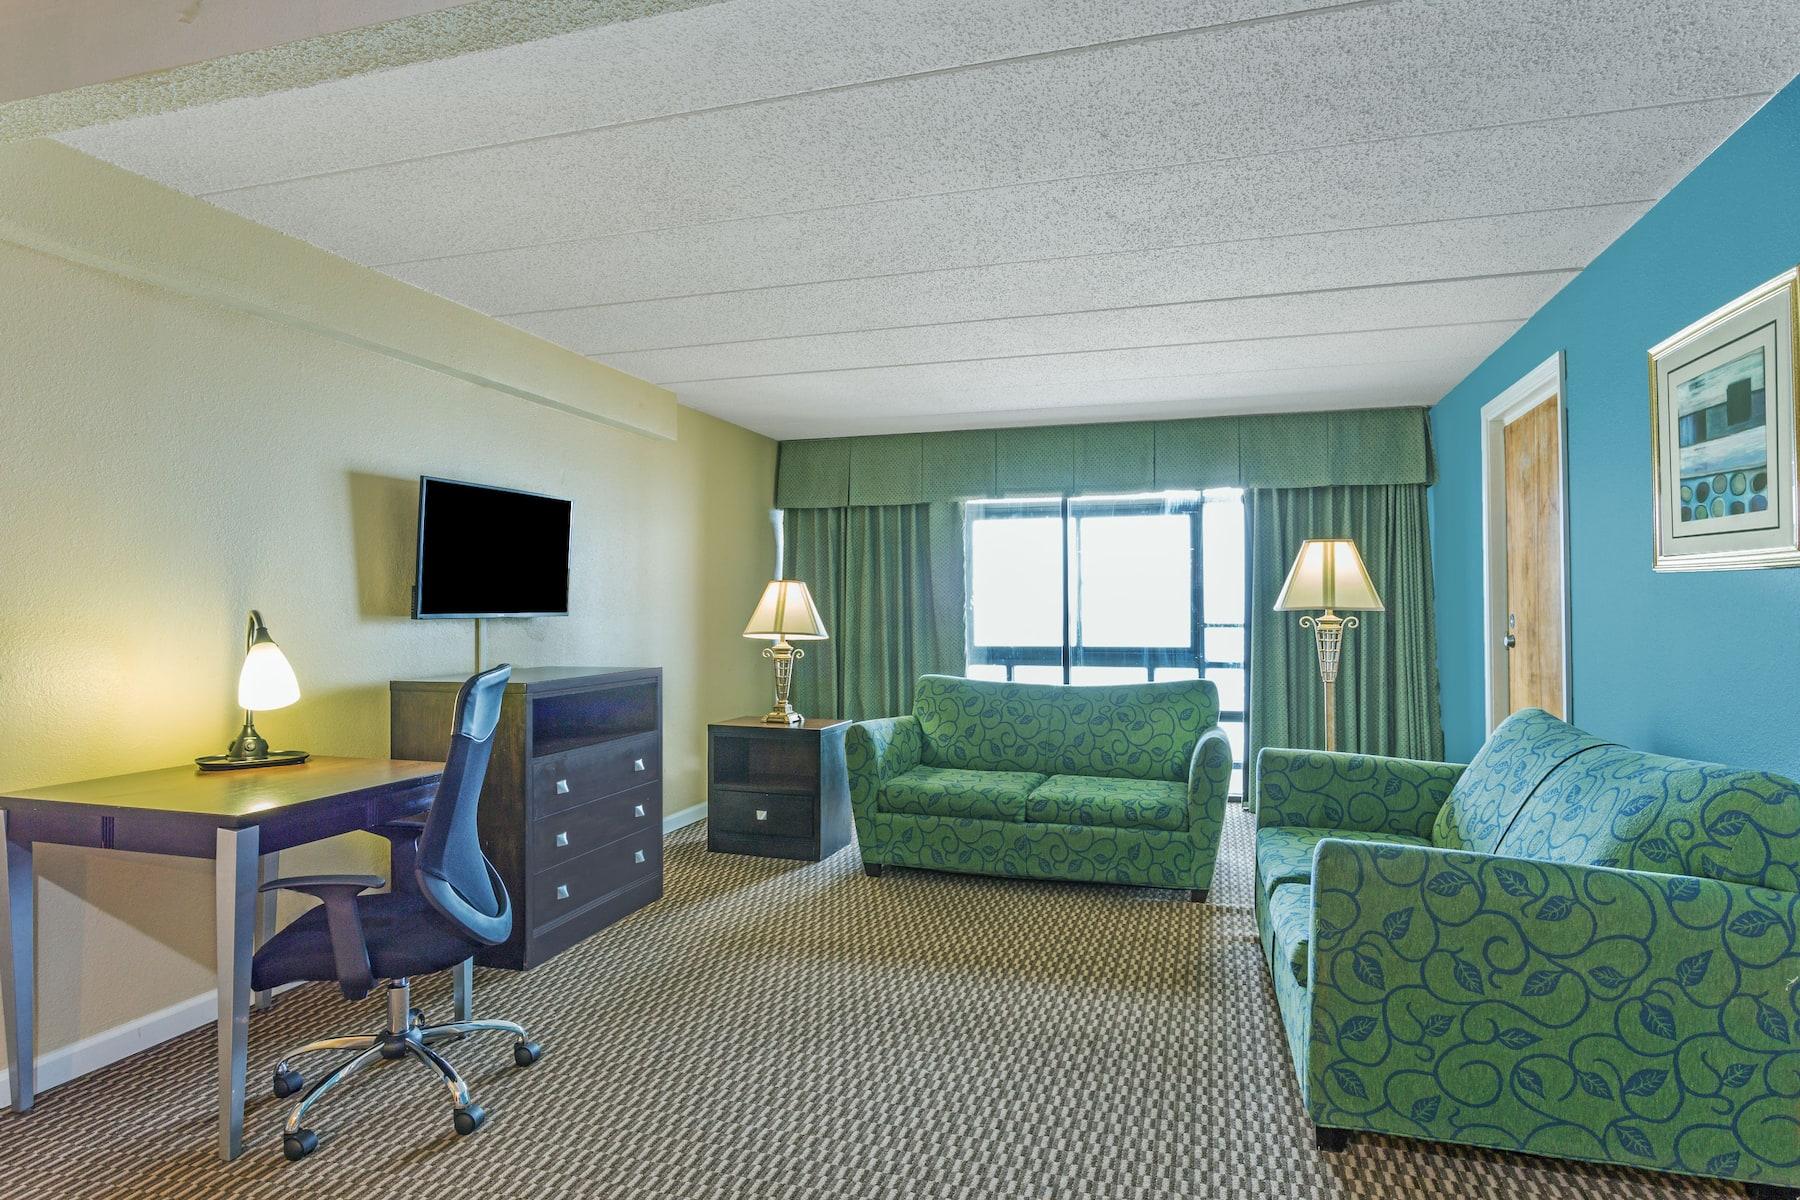 2 Bedroom Suites Virginia Beach Rooms